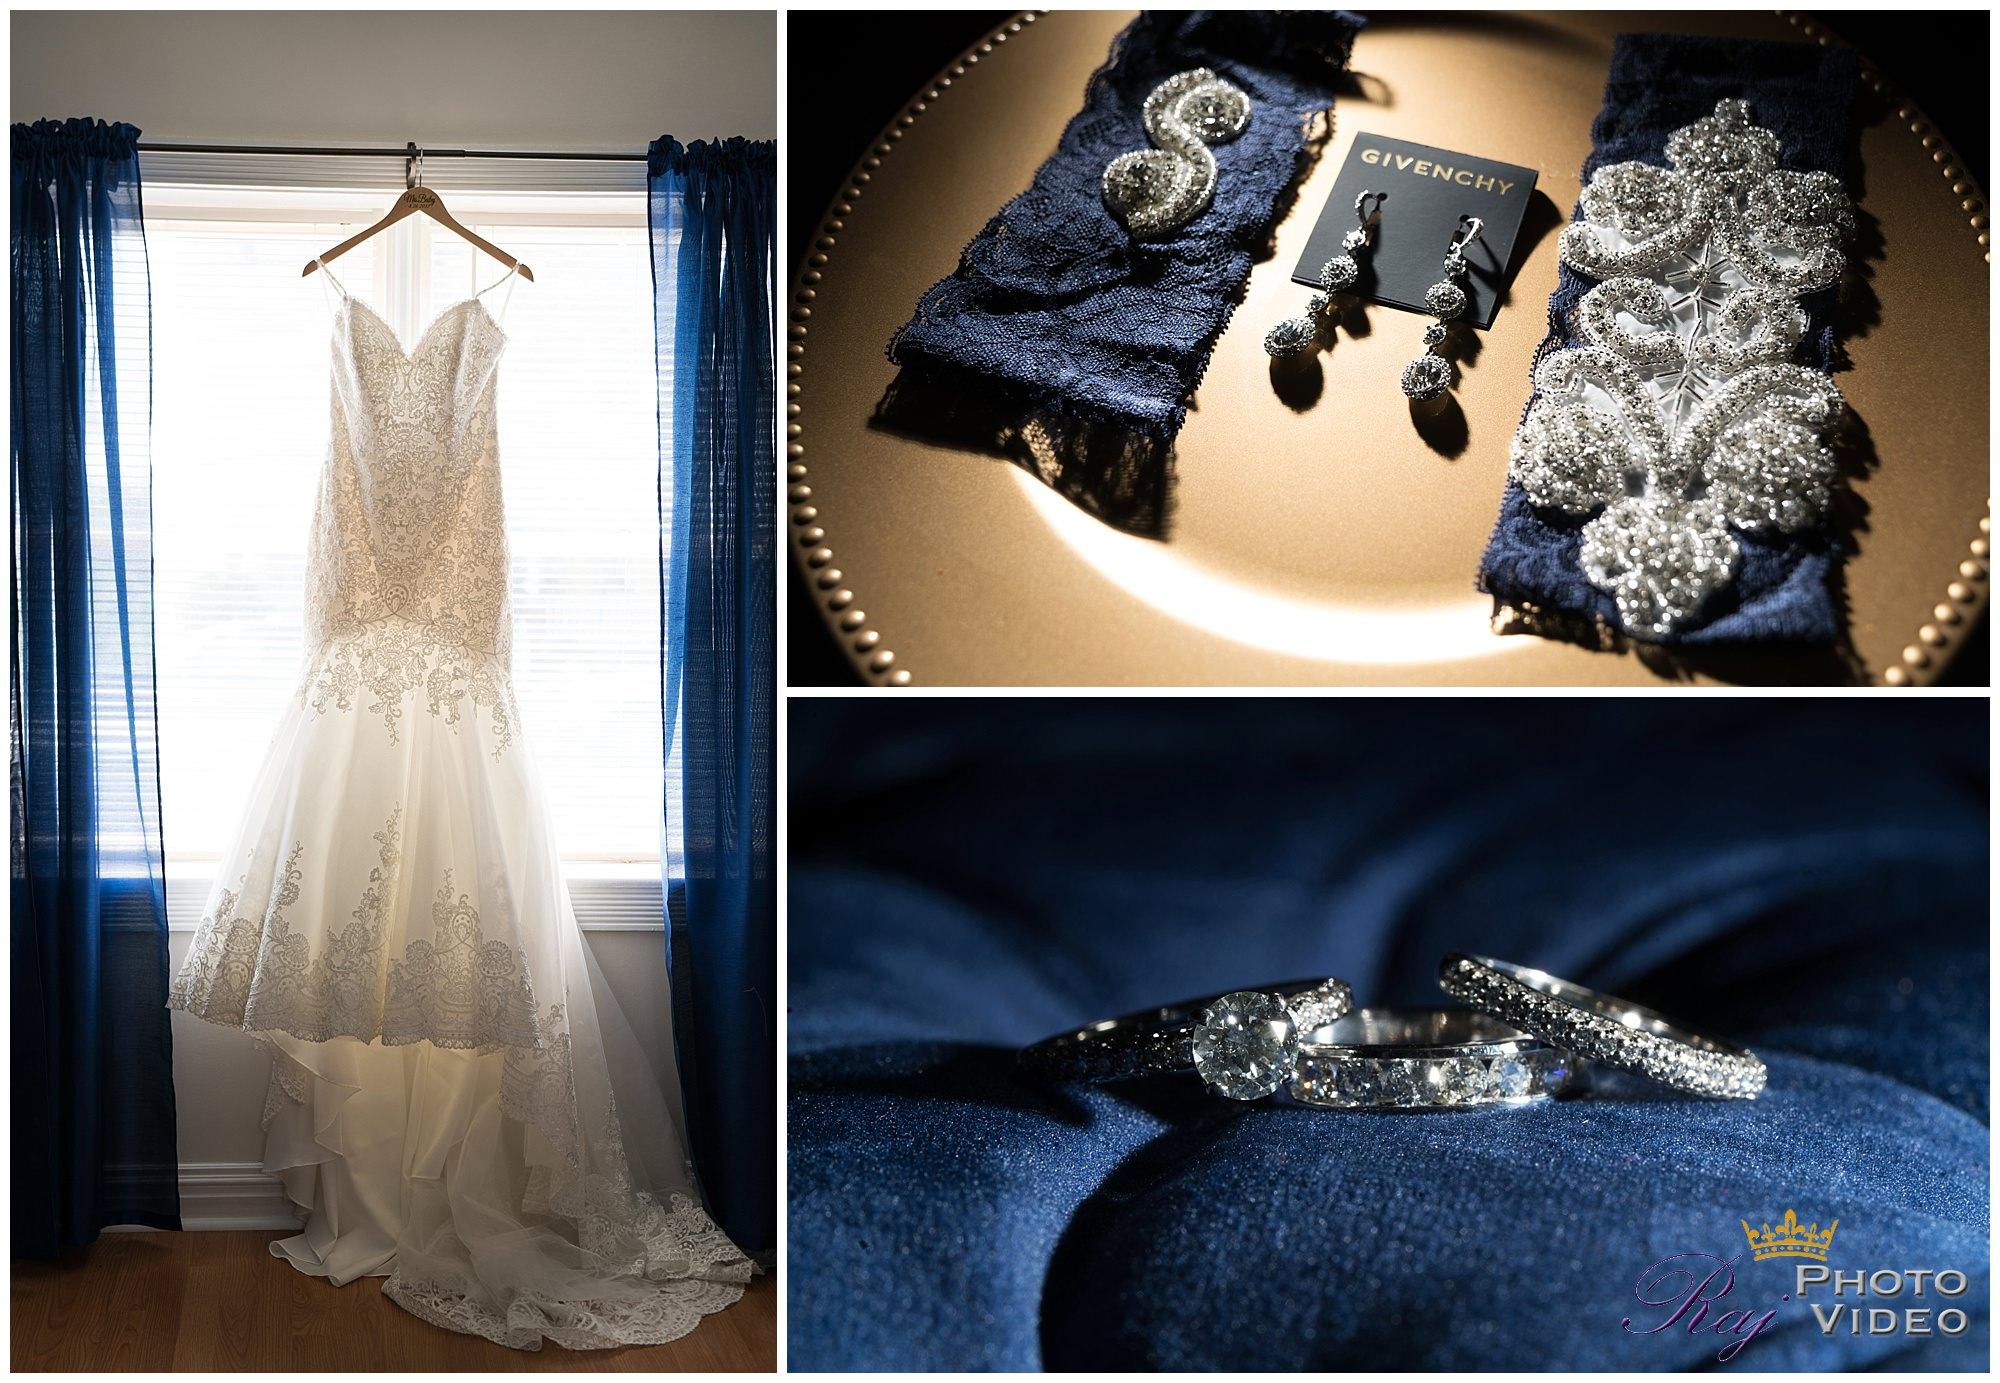 The-Armory-Perth-Amboy-NJ-Catholic-Wedding-Yudelkis-Stephen-1.jpg